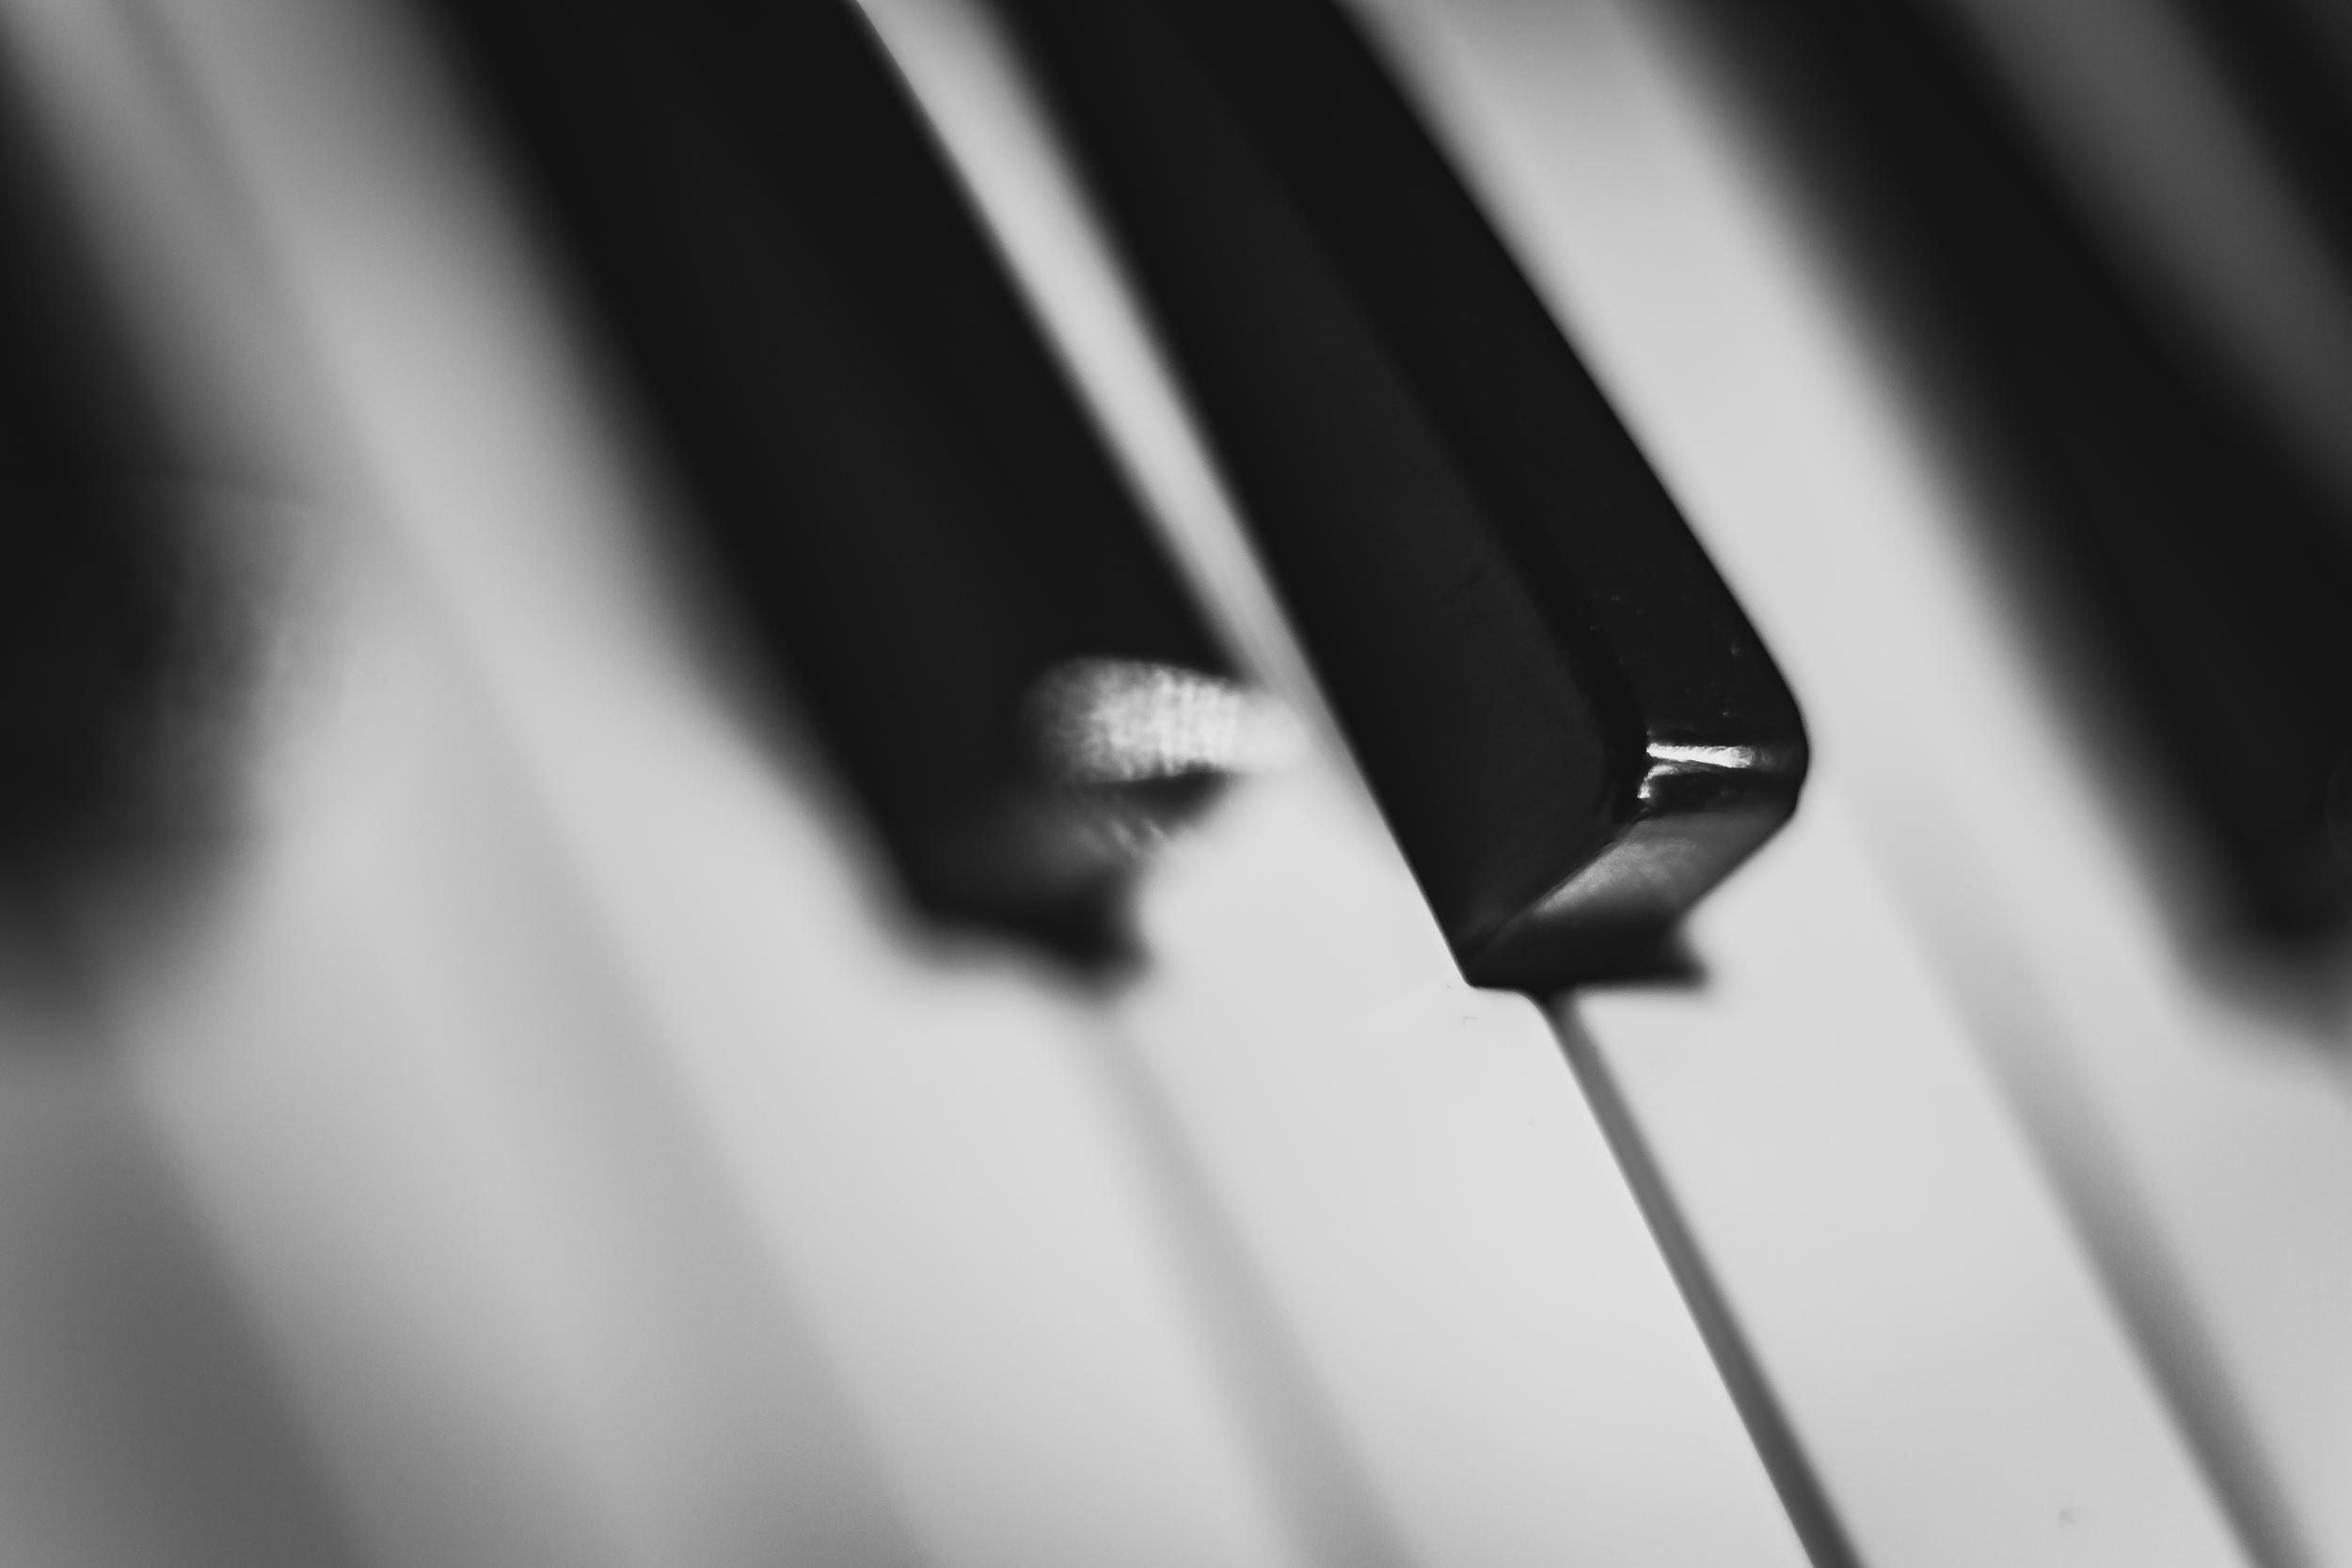 https://static.pexels.com/photos/18183/music-keys-piano-theme-colors.jpg